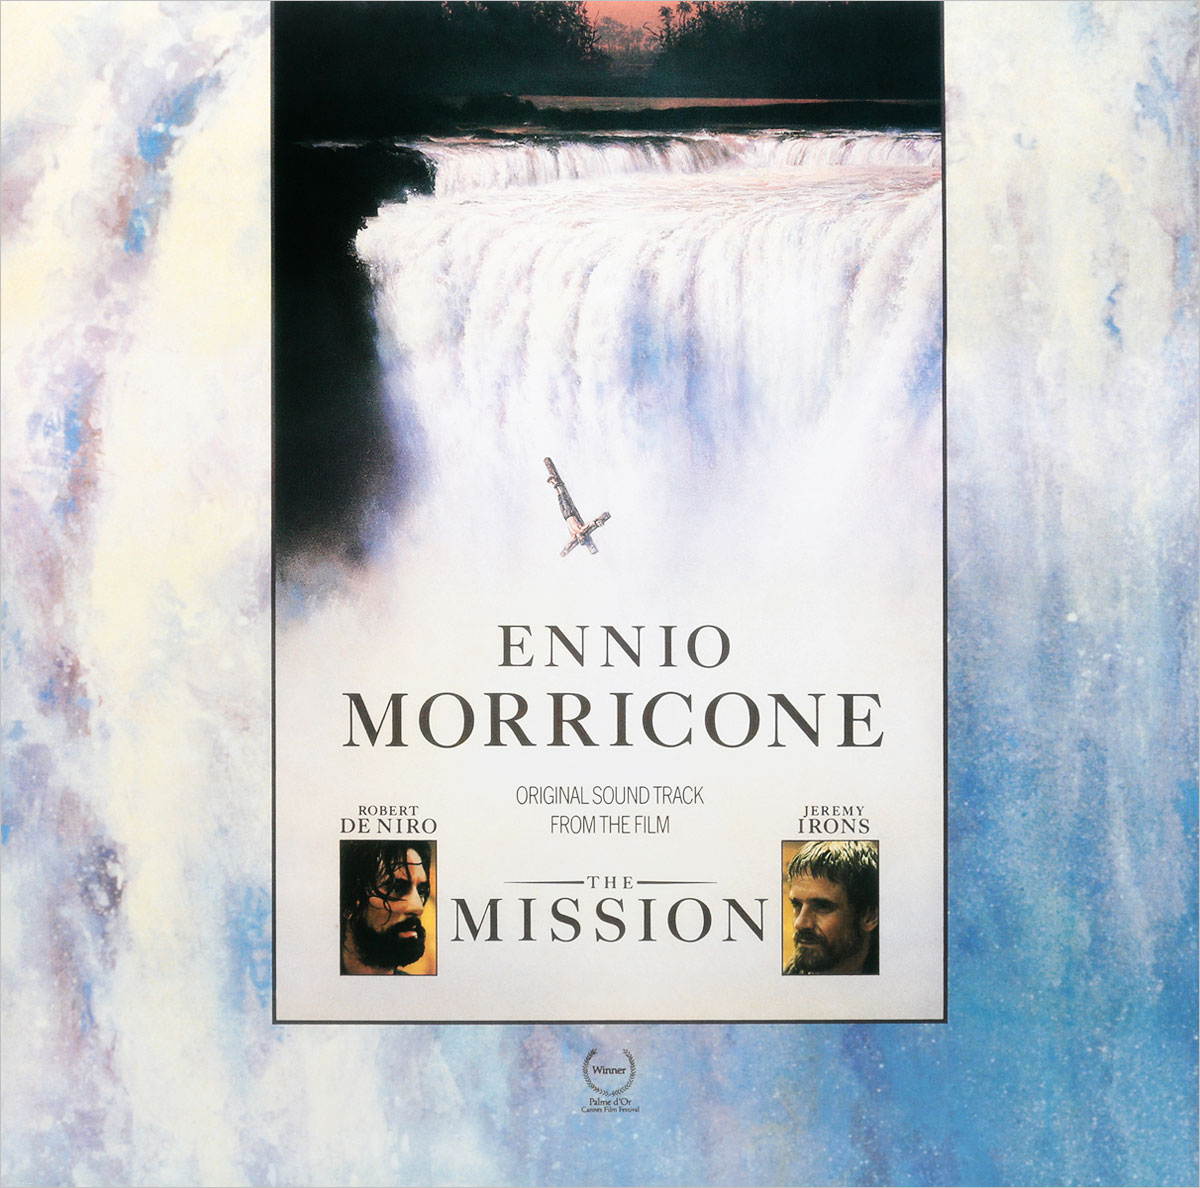 Эннио Морриконе Ennio Morricone. The Mission. Original Soundtrack (LP) ennio morricone jubilee lp